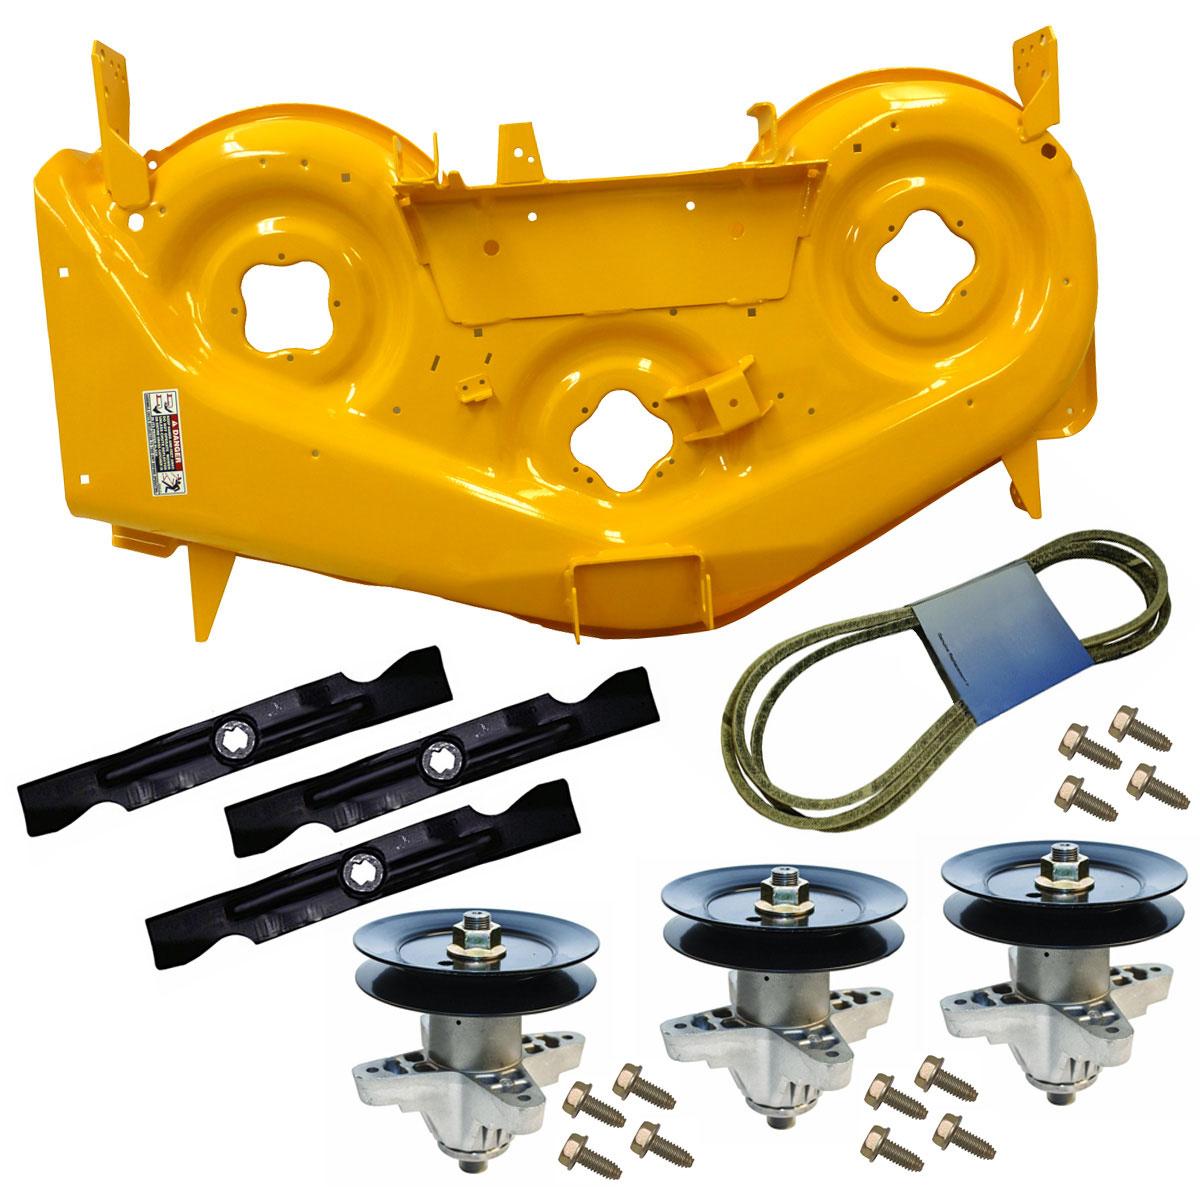 Rzt 50 Inch Yellow Deck Kit 903 04328c 0716